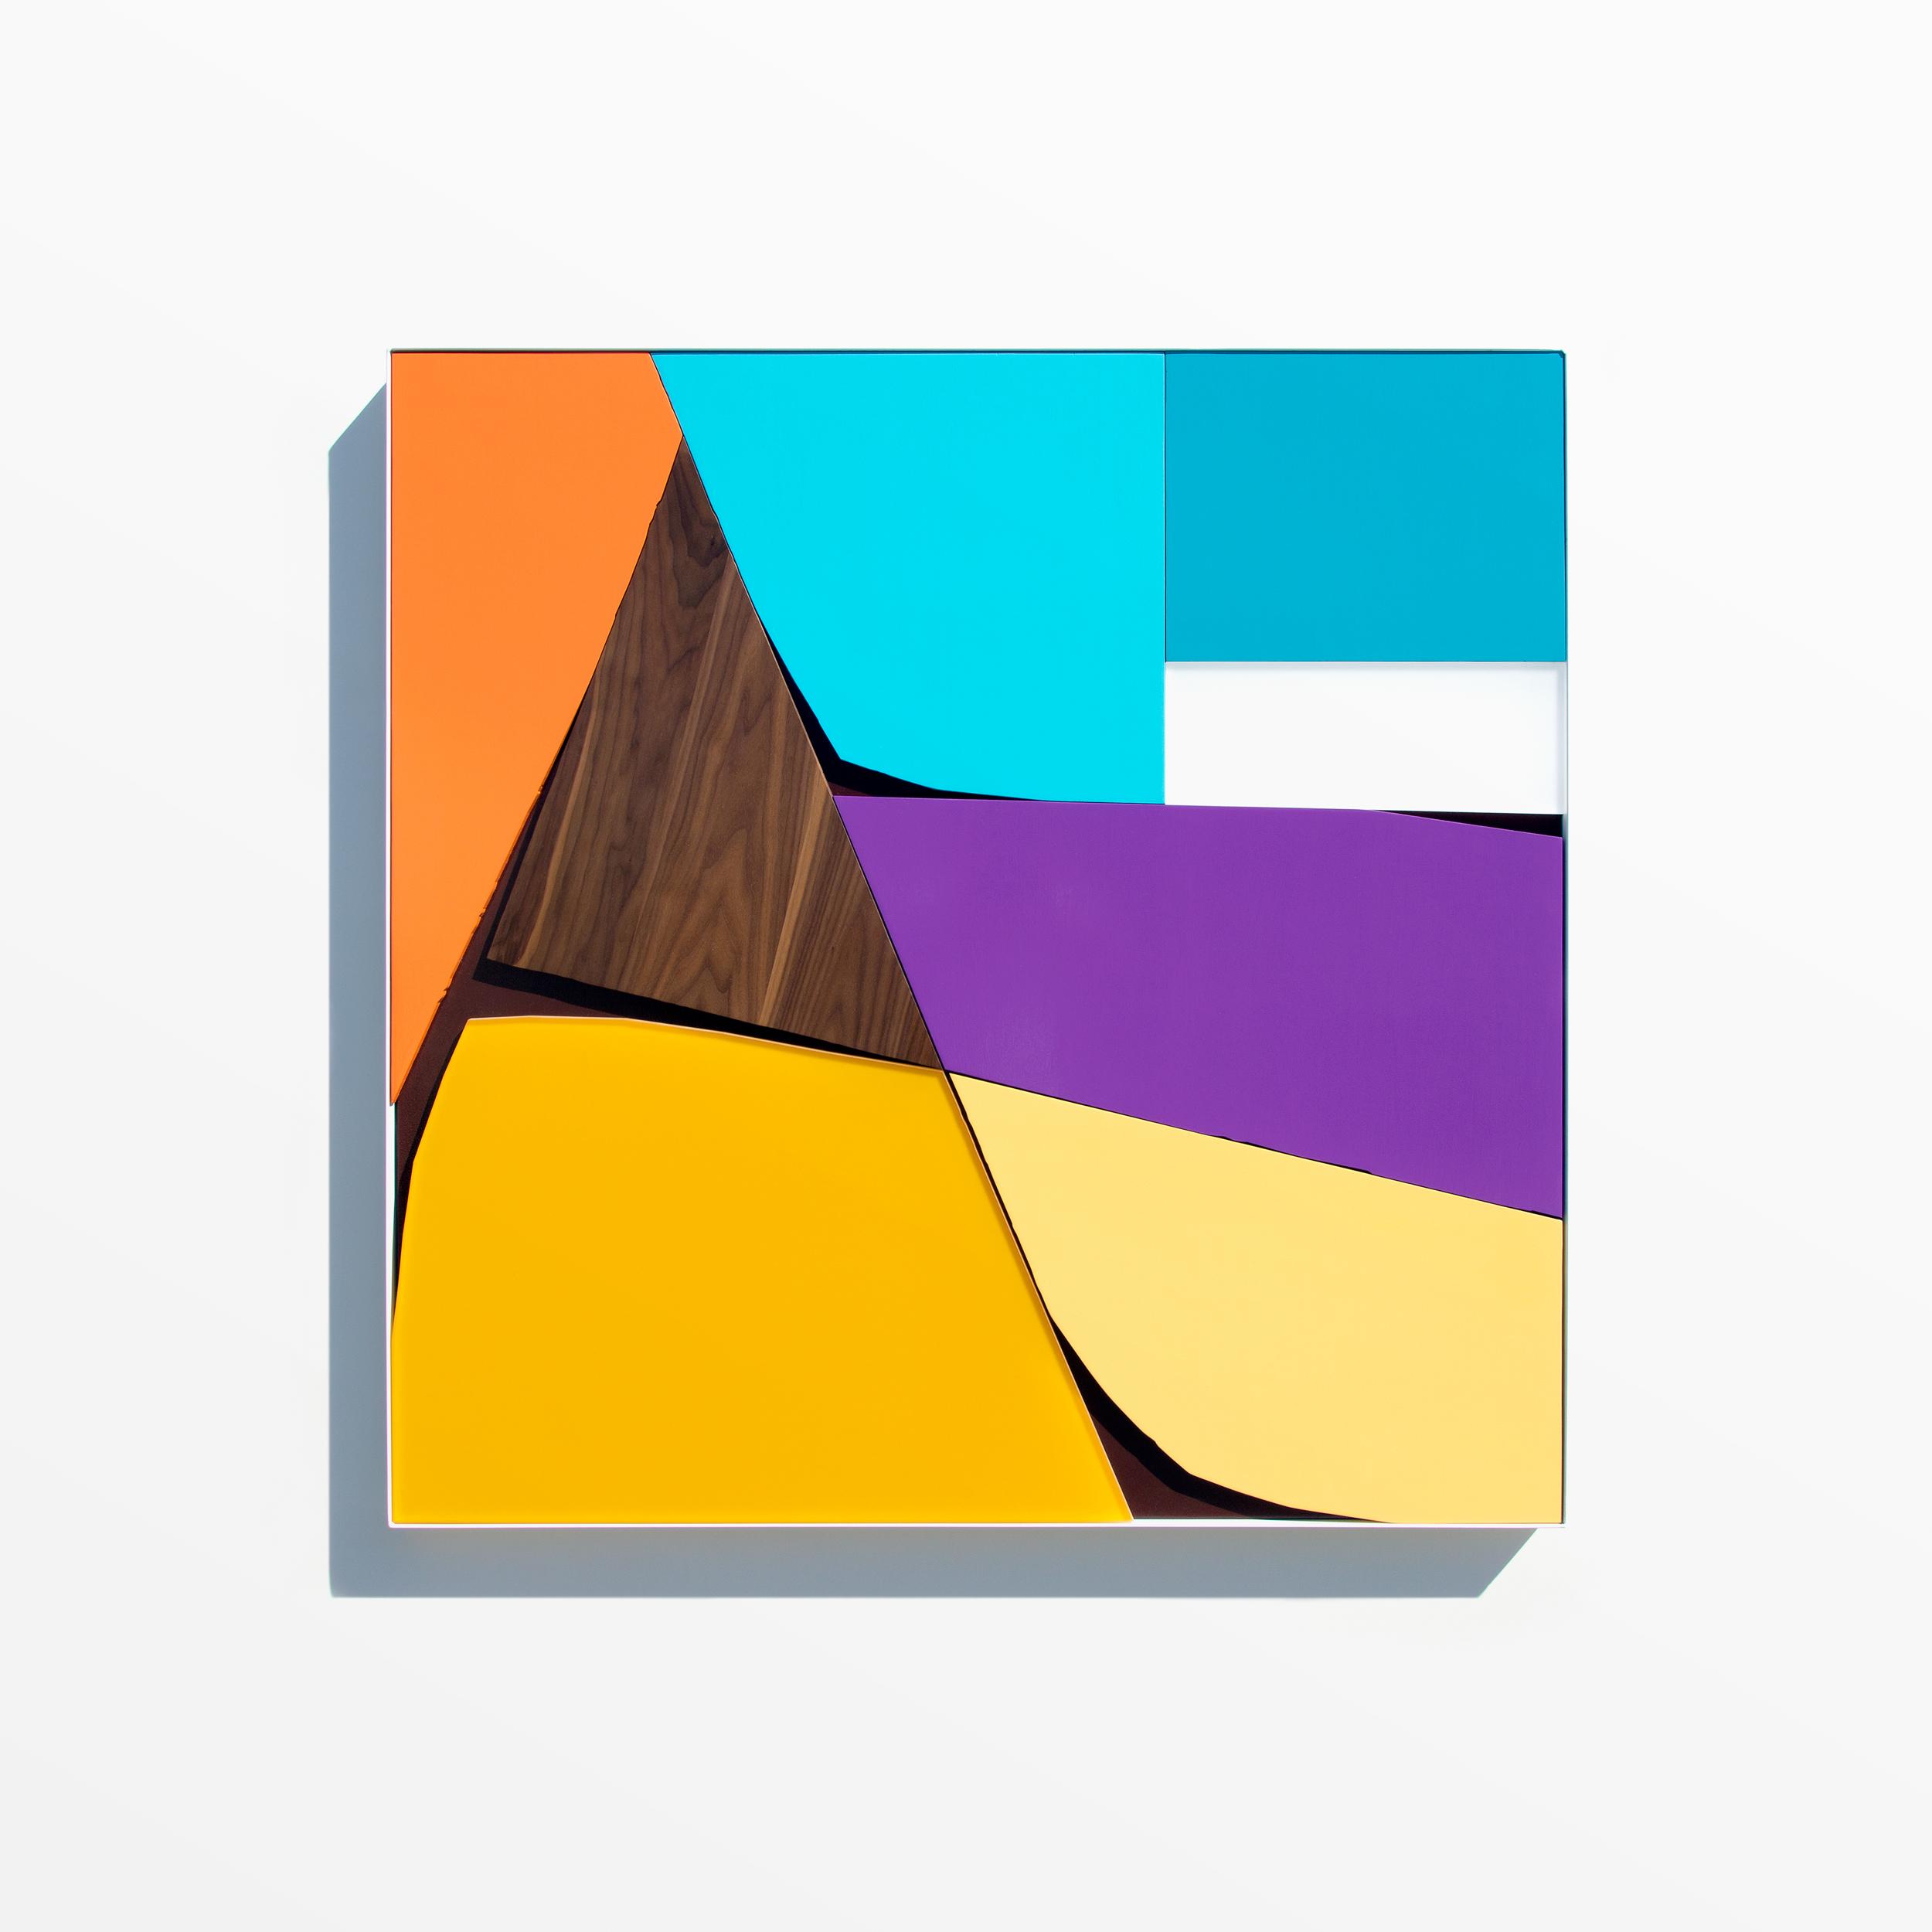 Charlie_Edmiston_Material_Exploration_Series_2;1:5_2017.jpg